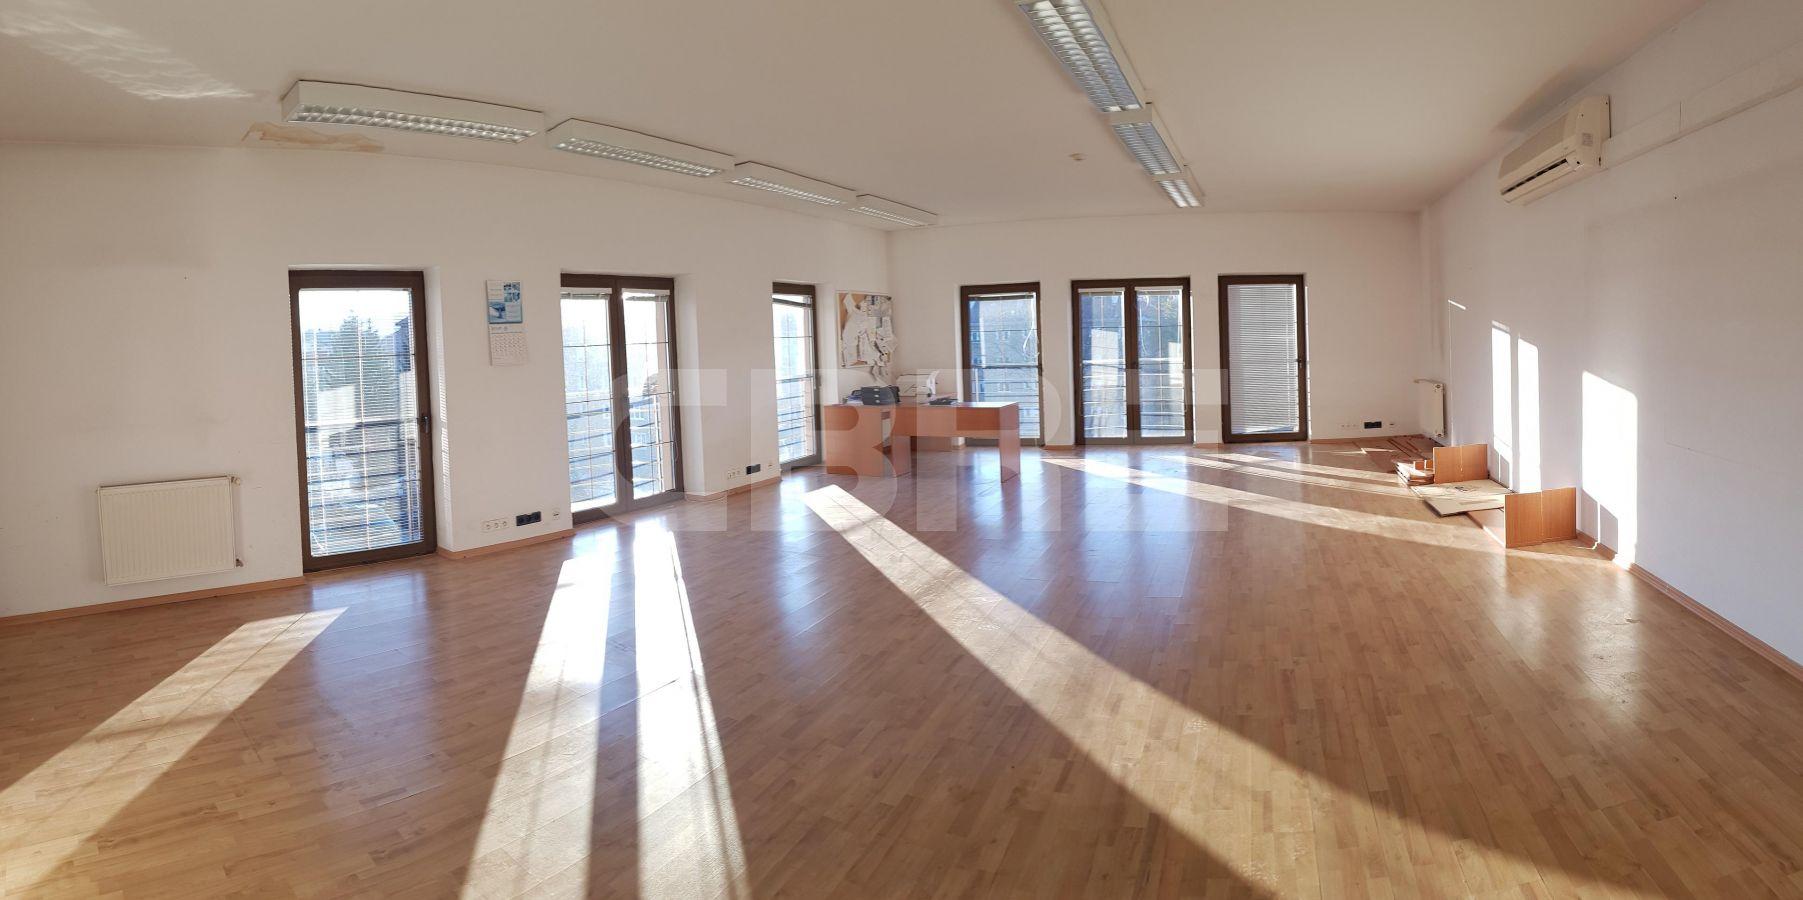 Kancelárie Dolná ulica, Banská Bystrica, Banská Bystrica | Prenájom kancelárií od CBRE | 2